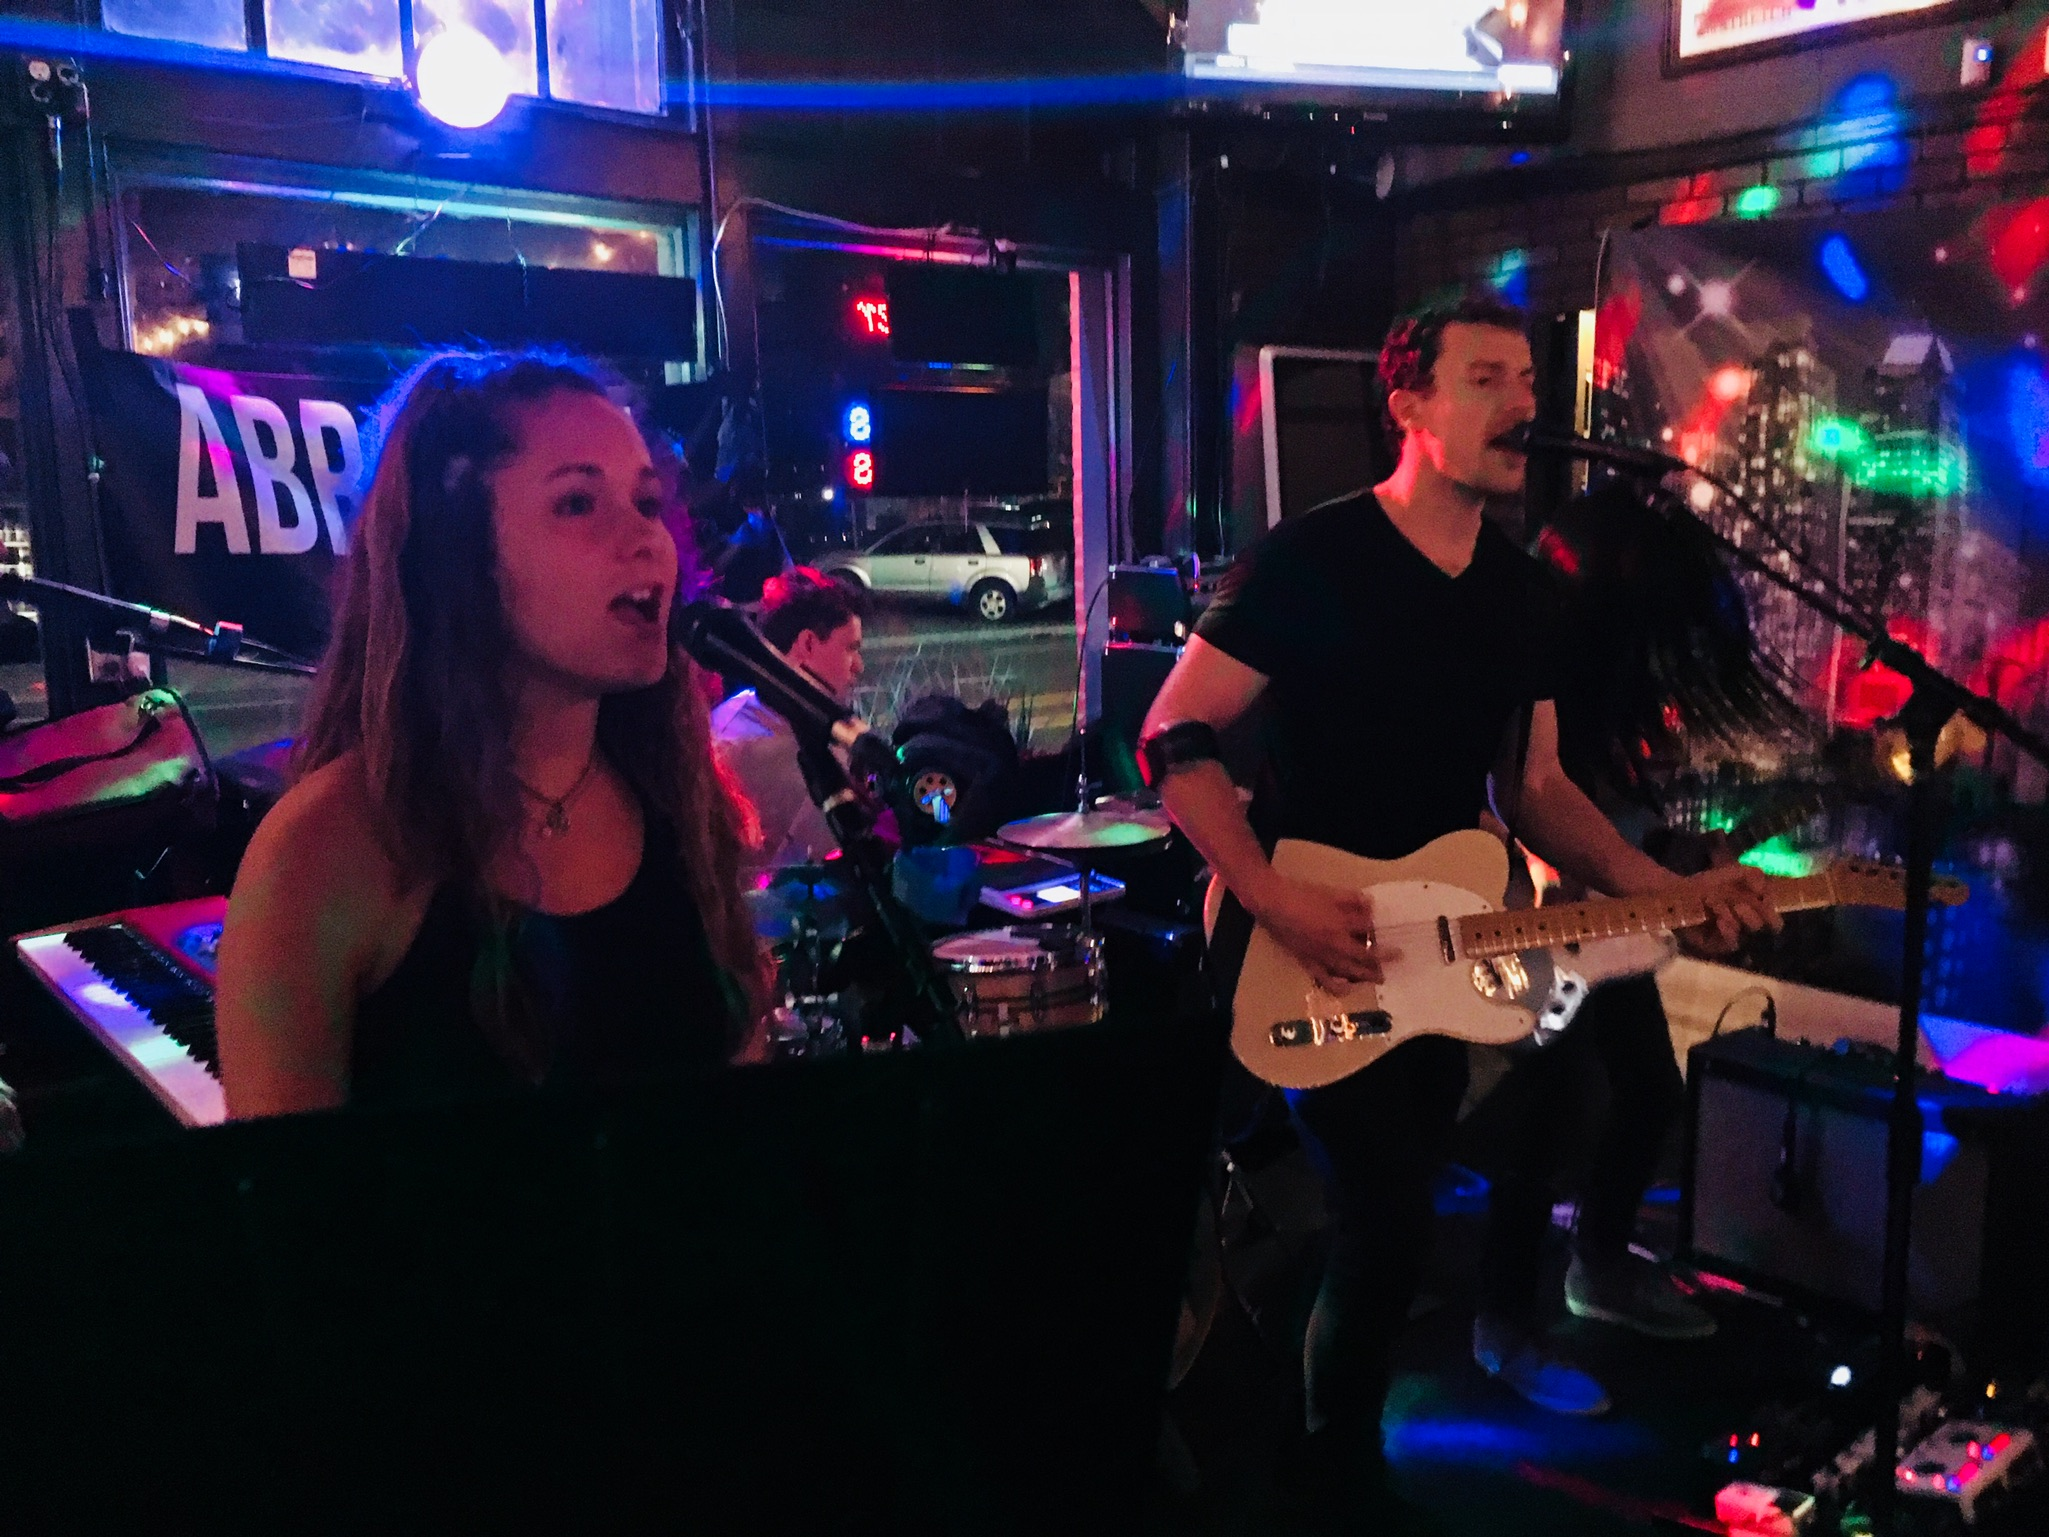 Abraham Band electrifies RR6 Kitchen and Bar on May 25.